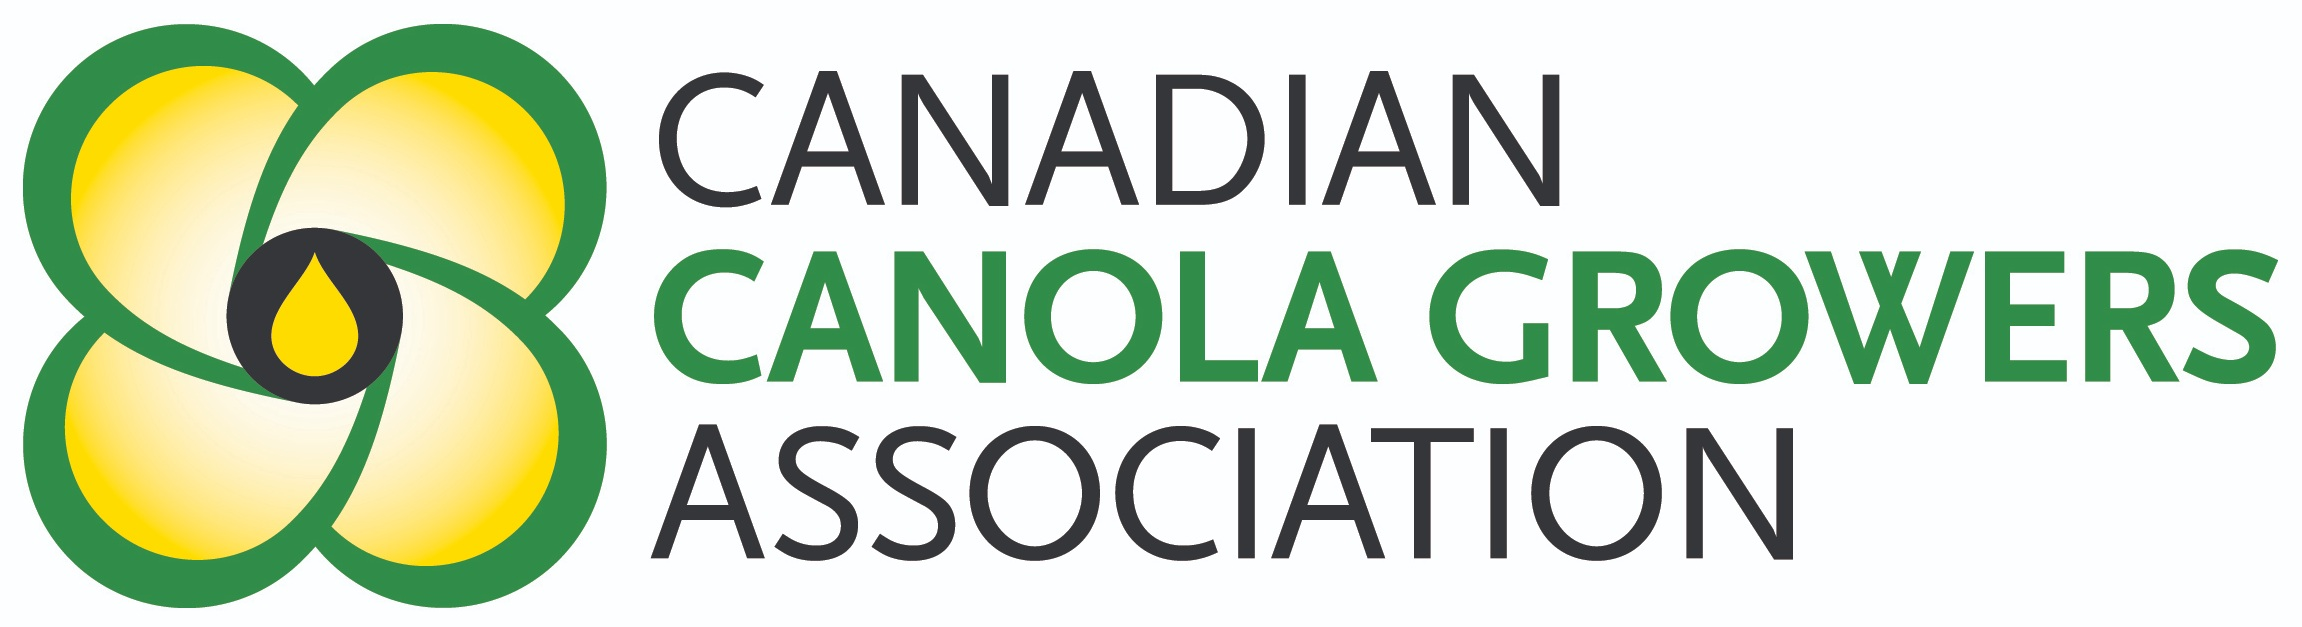 Canadian Canola Growers Association